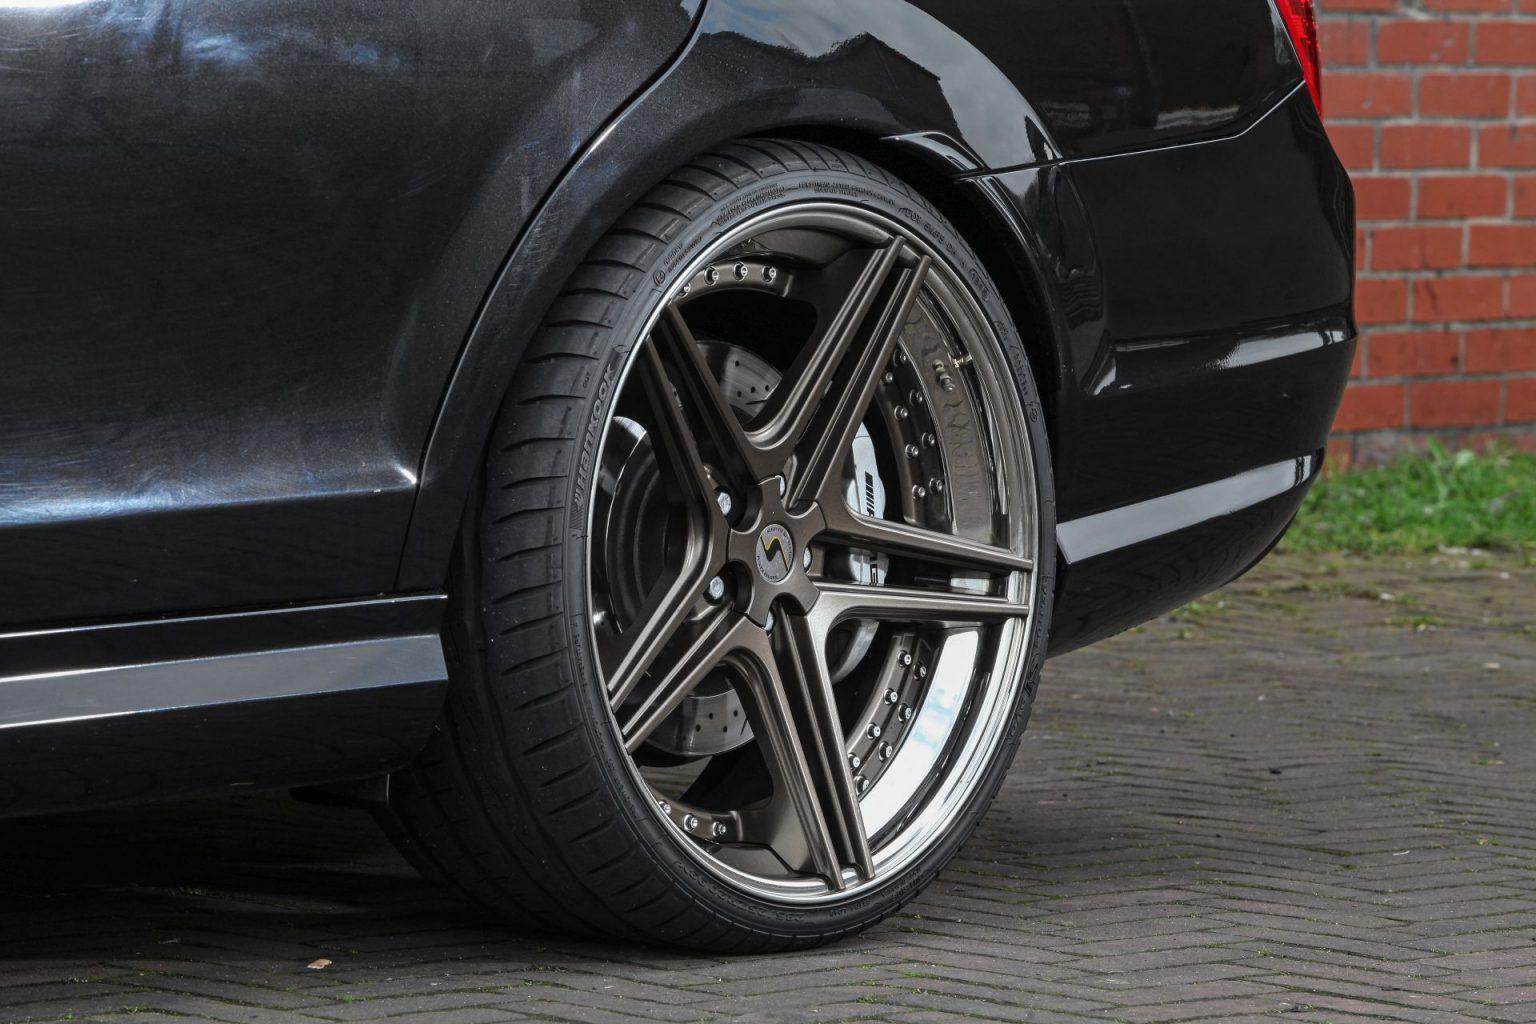 Mercedes C63 Amg Wheels By Raceland Fsline Schmidt Wheels